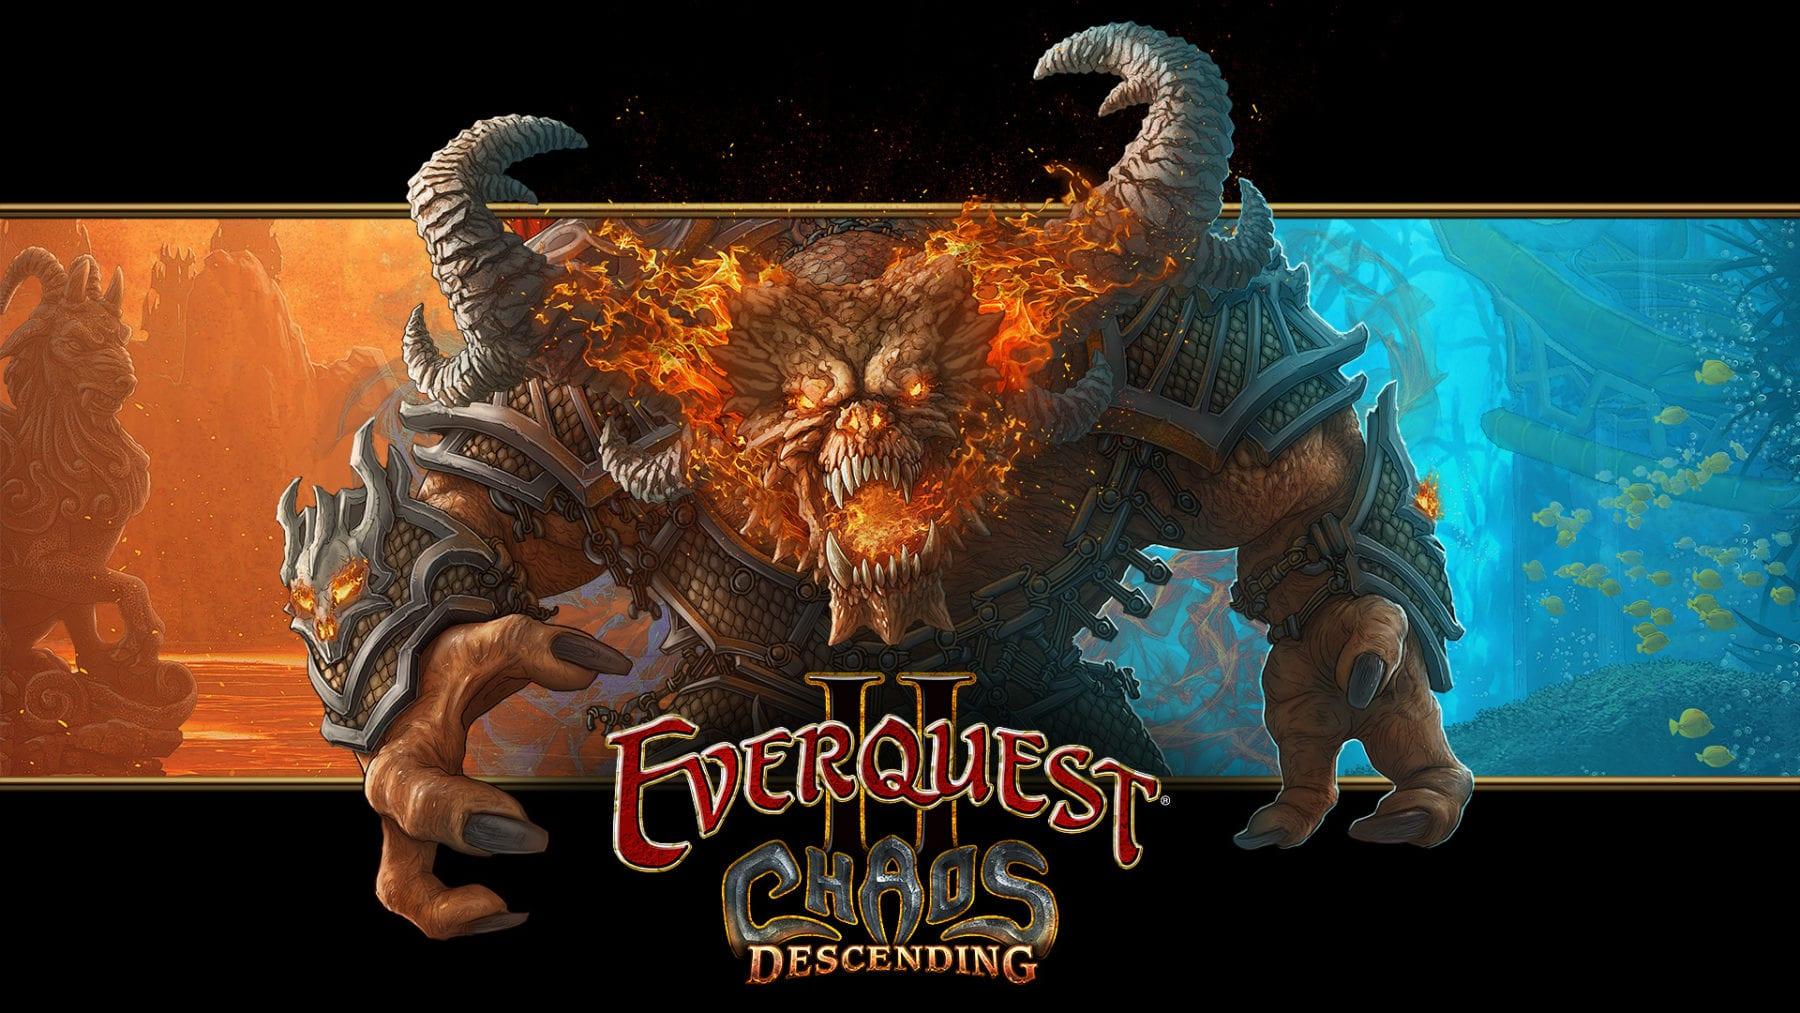 La expansión Chaos Descending llega para EverQuest 2